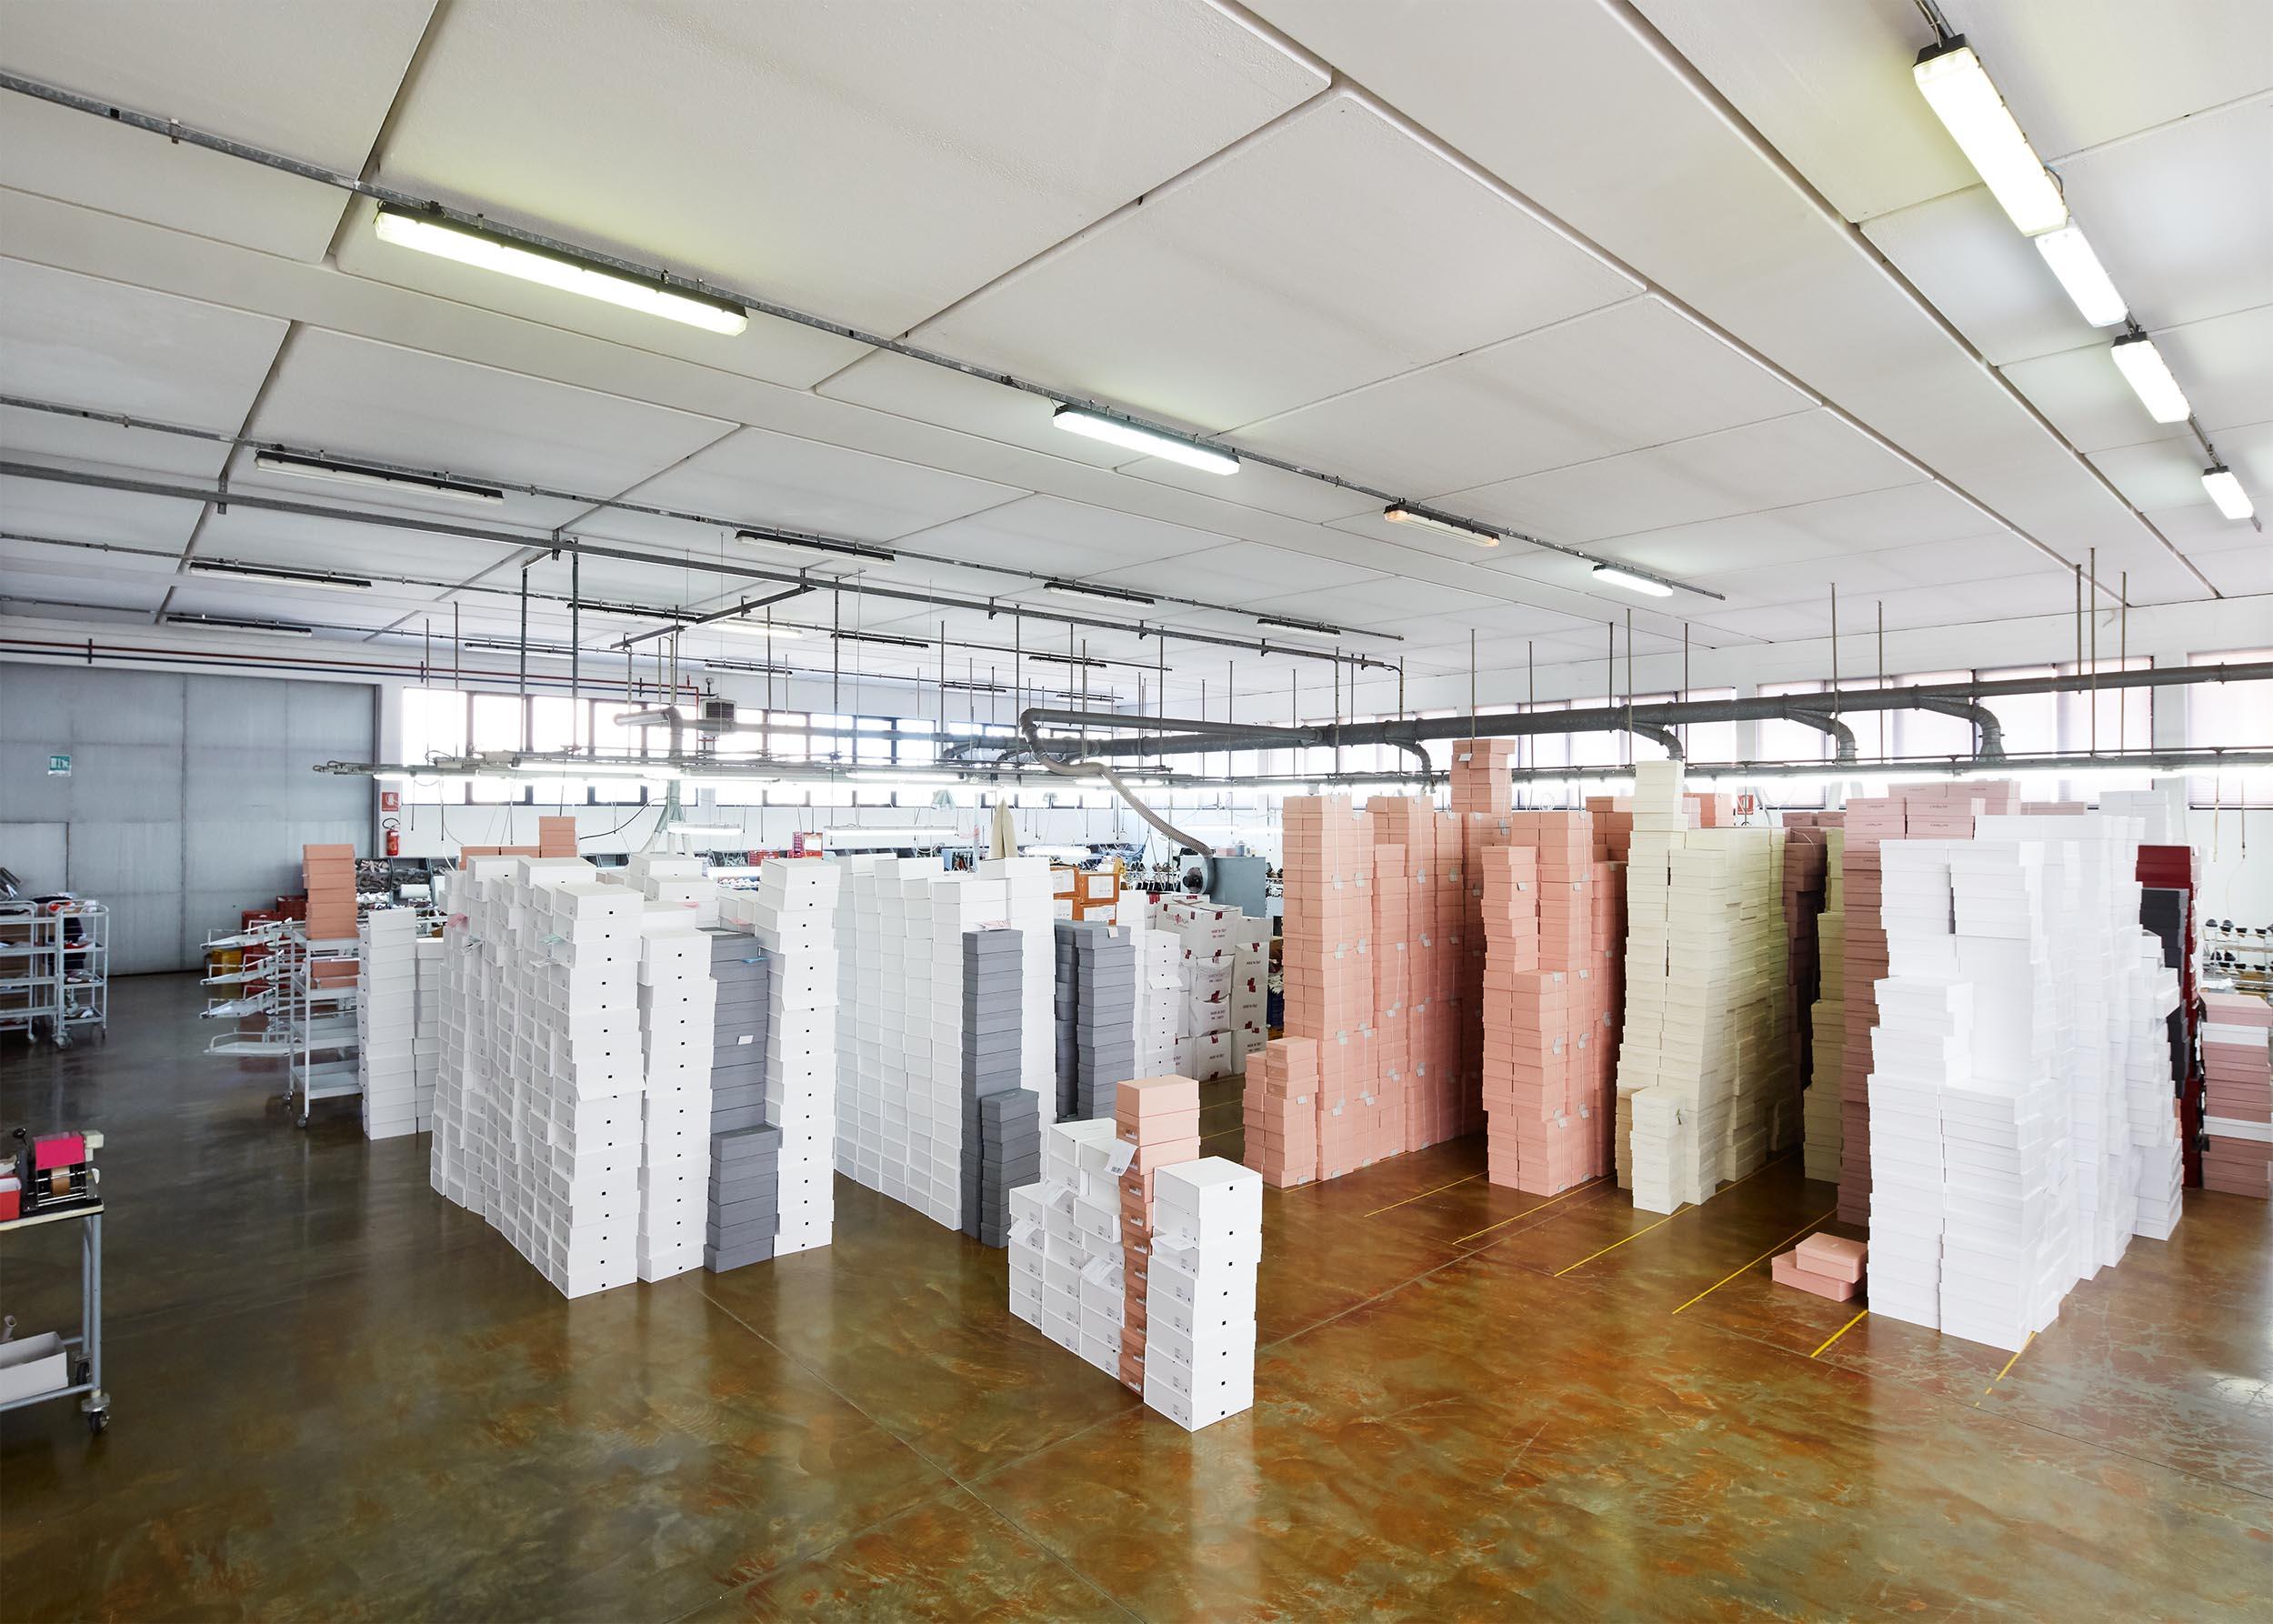 270417_cavallini-fabbrica_086.jpg